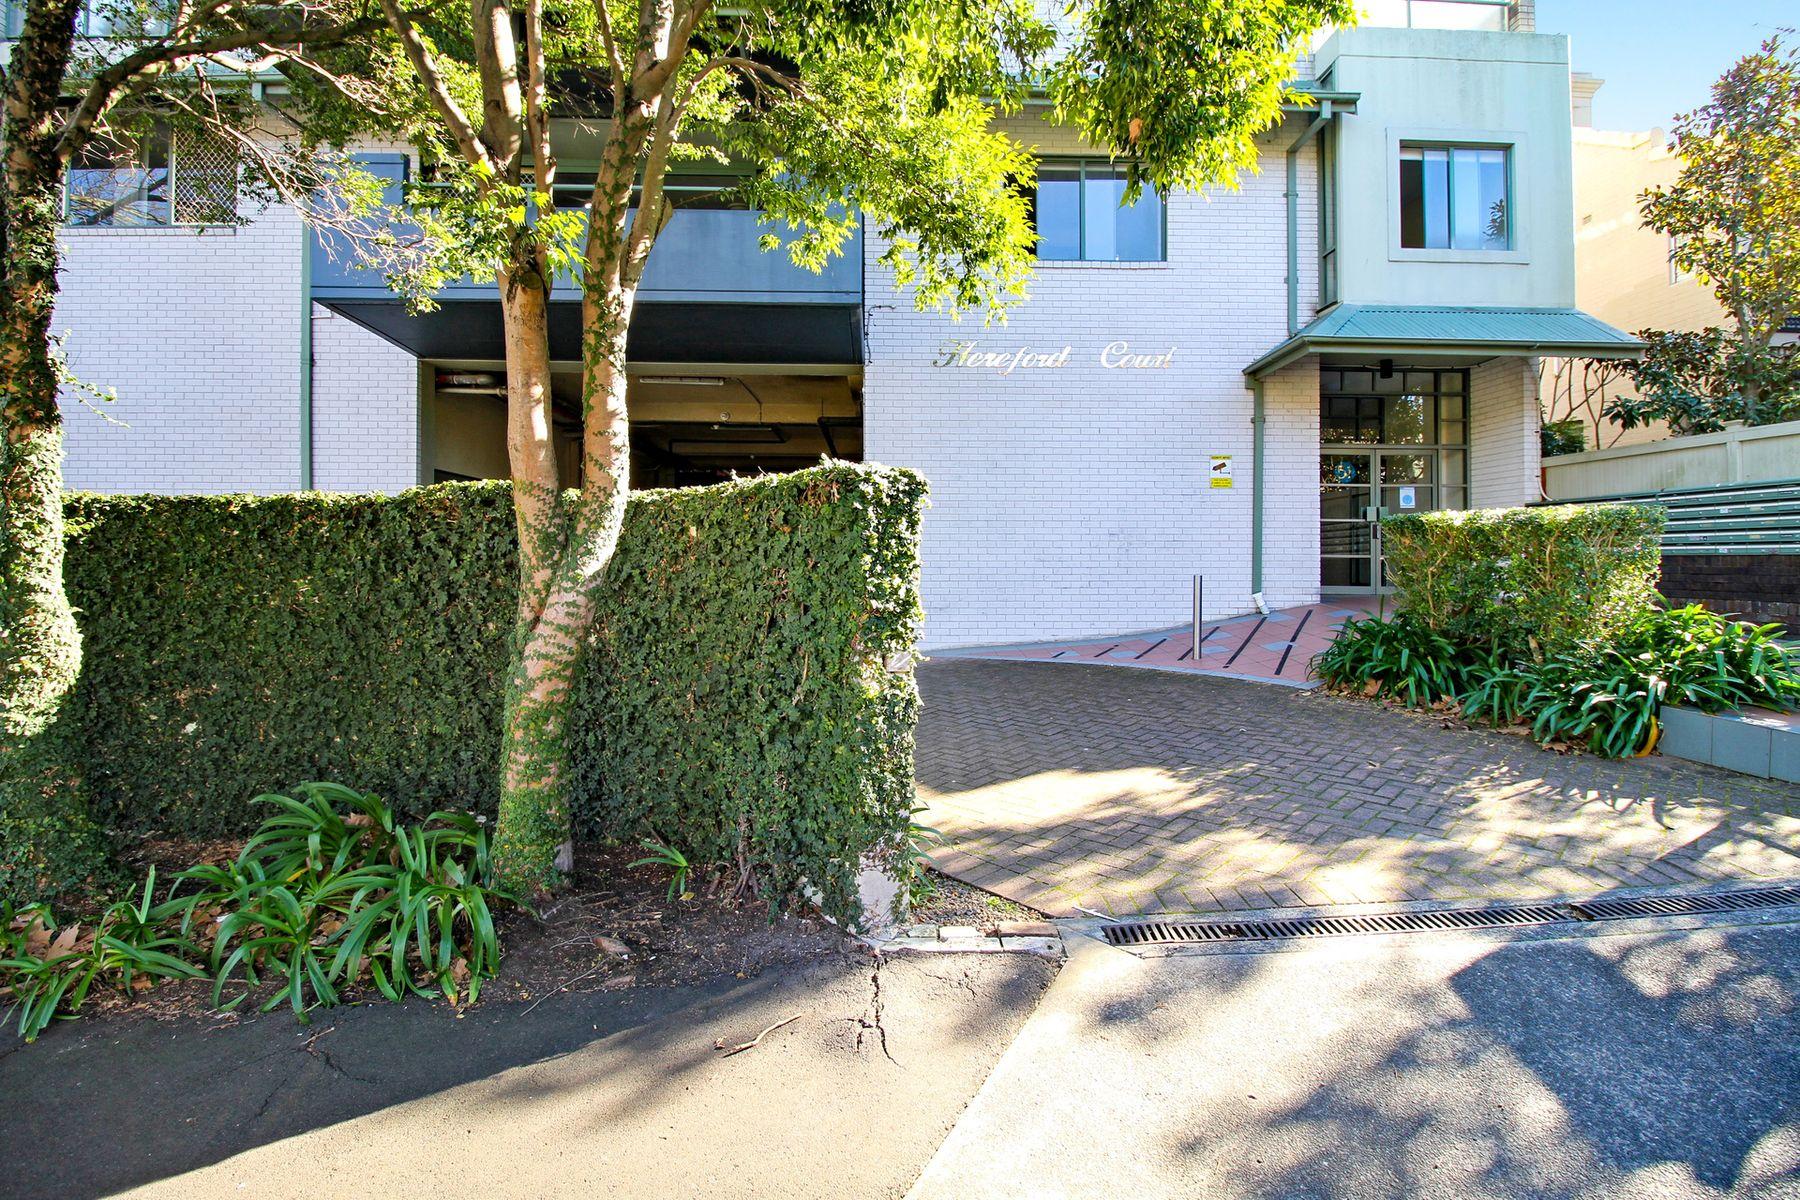 26/51 Hereford Street, Glebe, NSW 2037